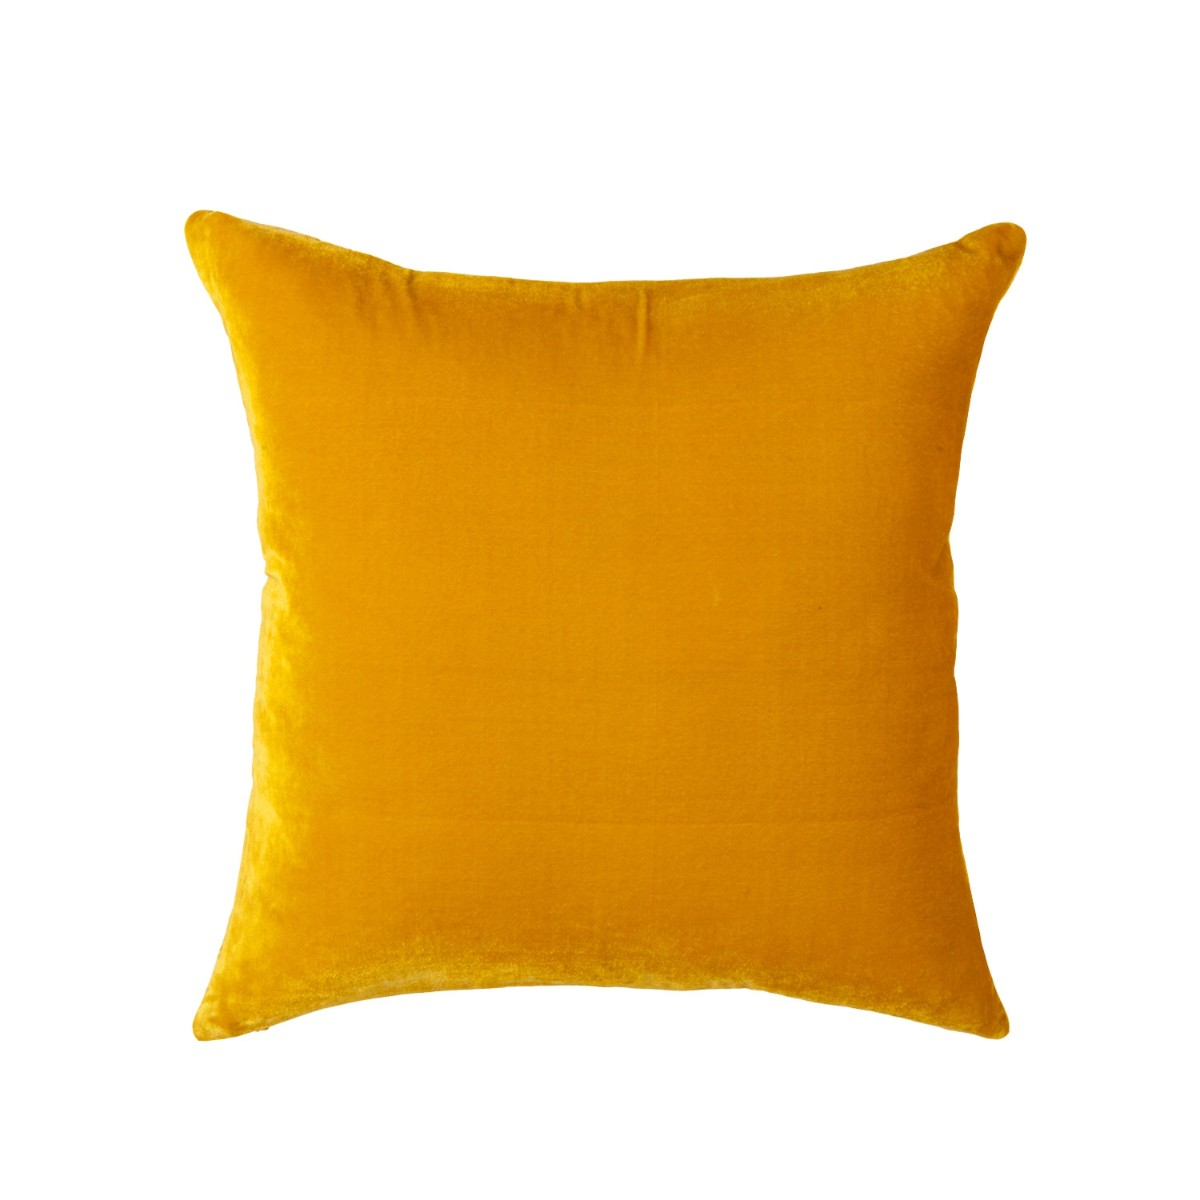 William Yeoward |Paddy Velvet Cushion Mustard